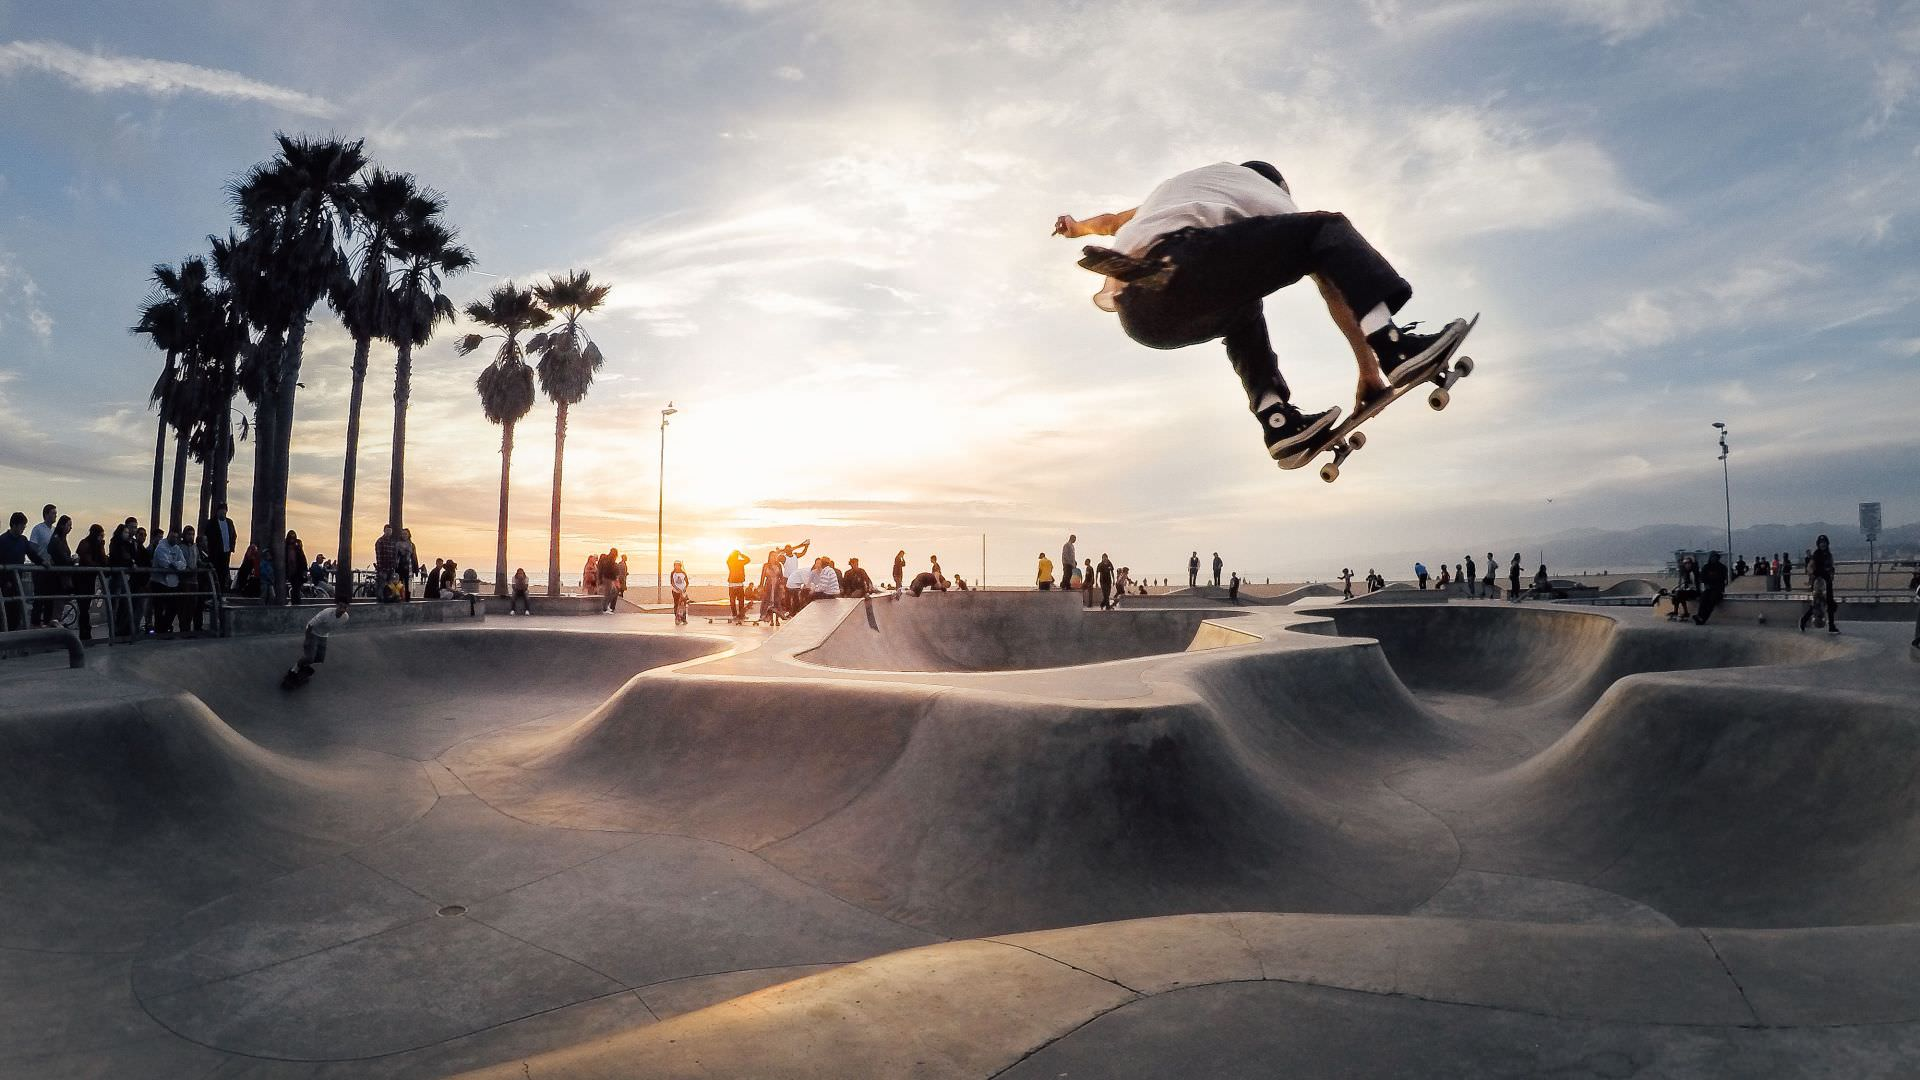 venice skate park on venice beach